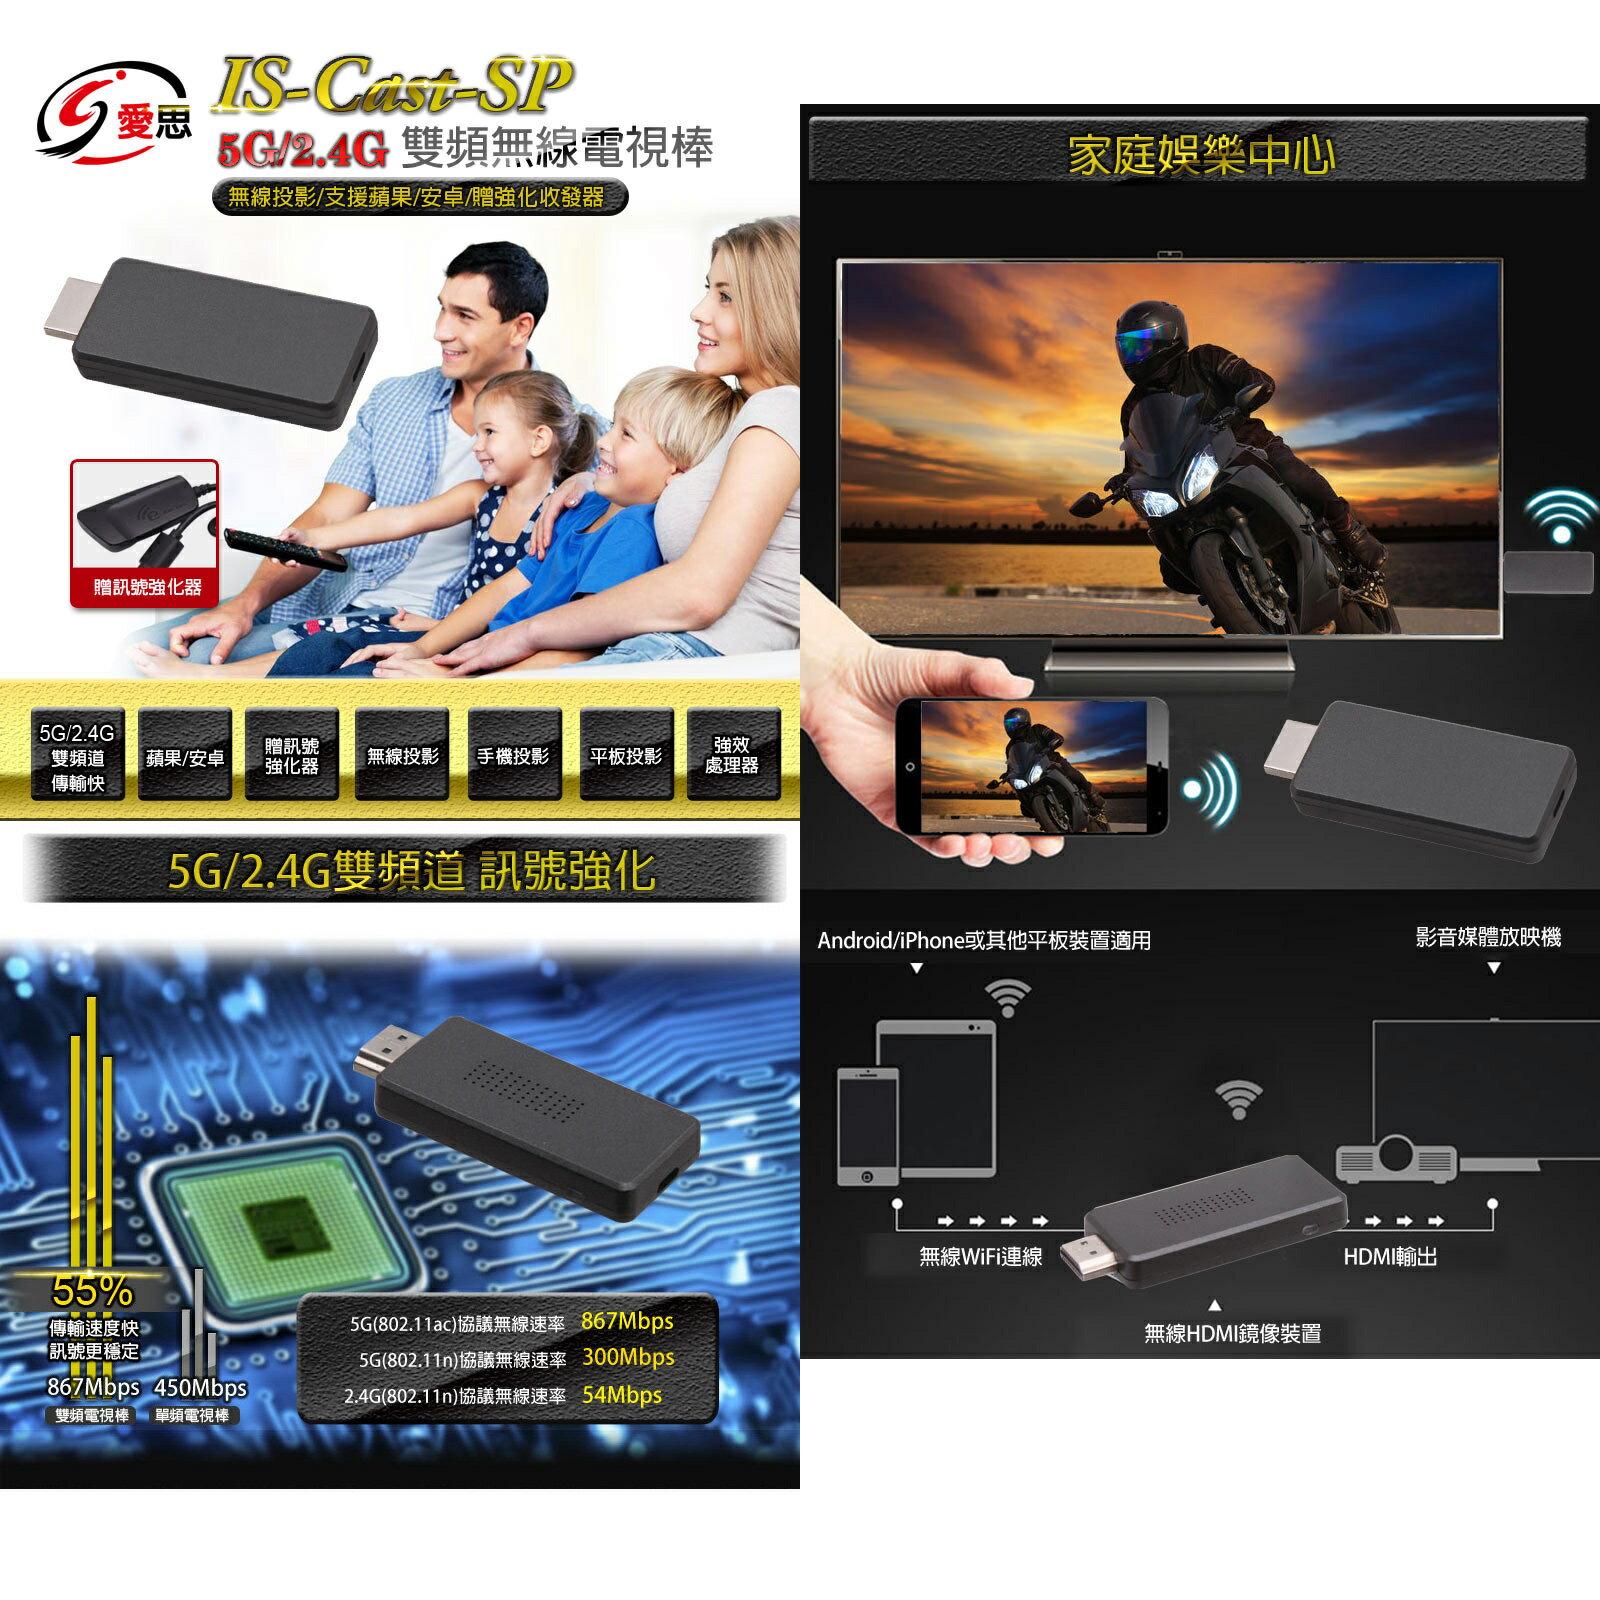 ISCAST-SP雙頻無線電視棒 5G/2.4G 訊號強化蘋果/安卓 無線傳輸